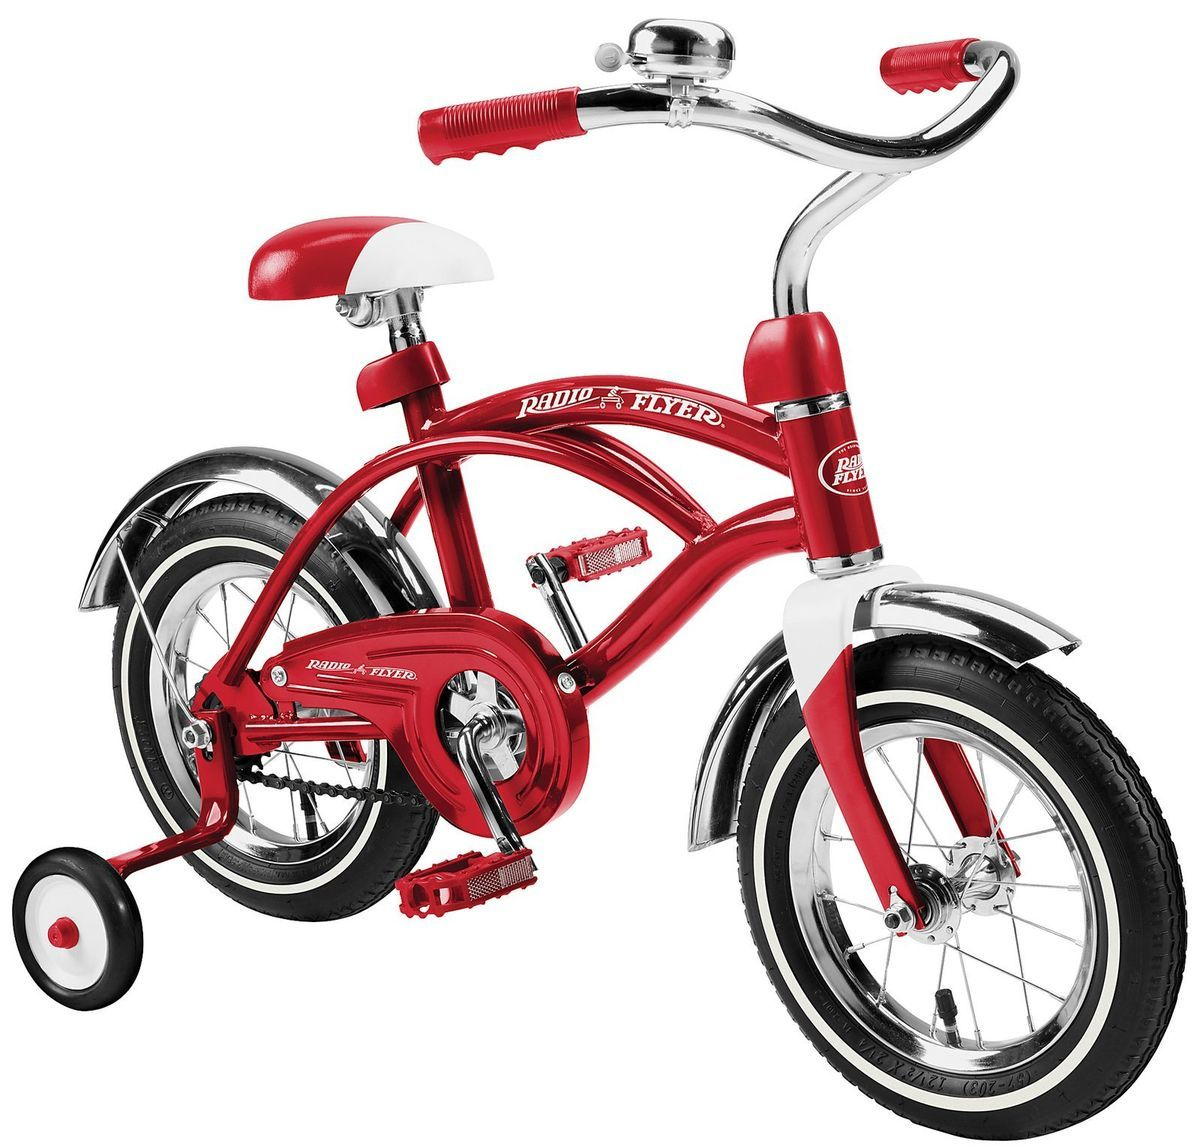 CLASSIC RED CRUISER 12 INCH Bike BOYS BICYCLE BMX TRAINING WHEELS